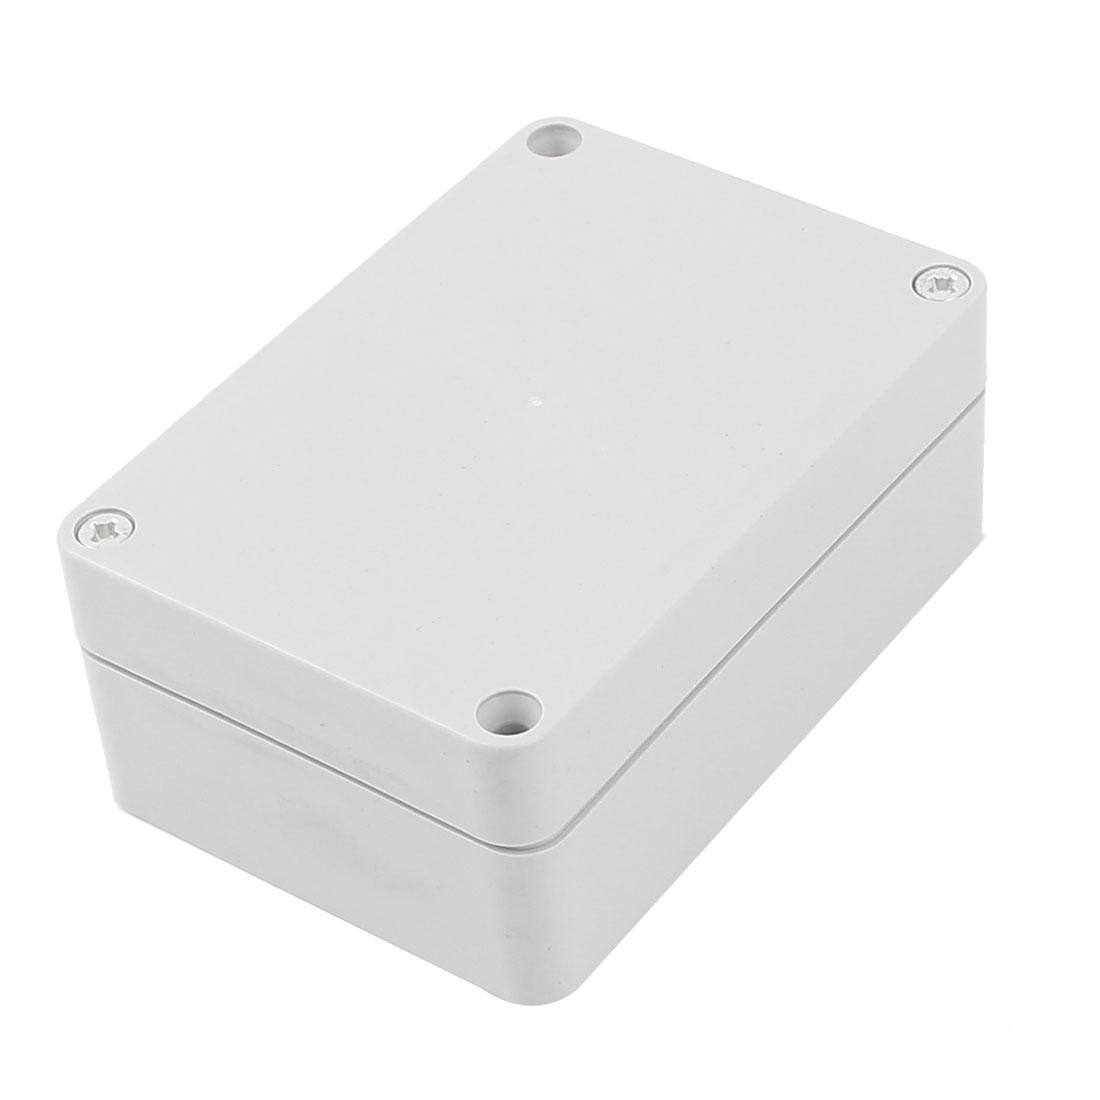 Dustproof IP65 Plastic Enclosure Junction Box Terminal Block 83x58x35mm